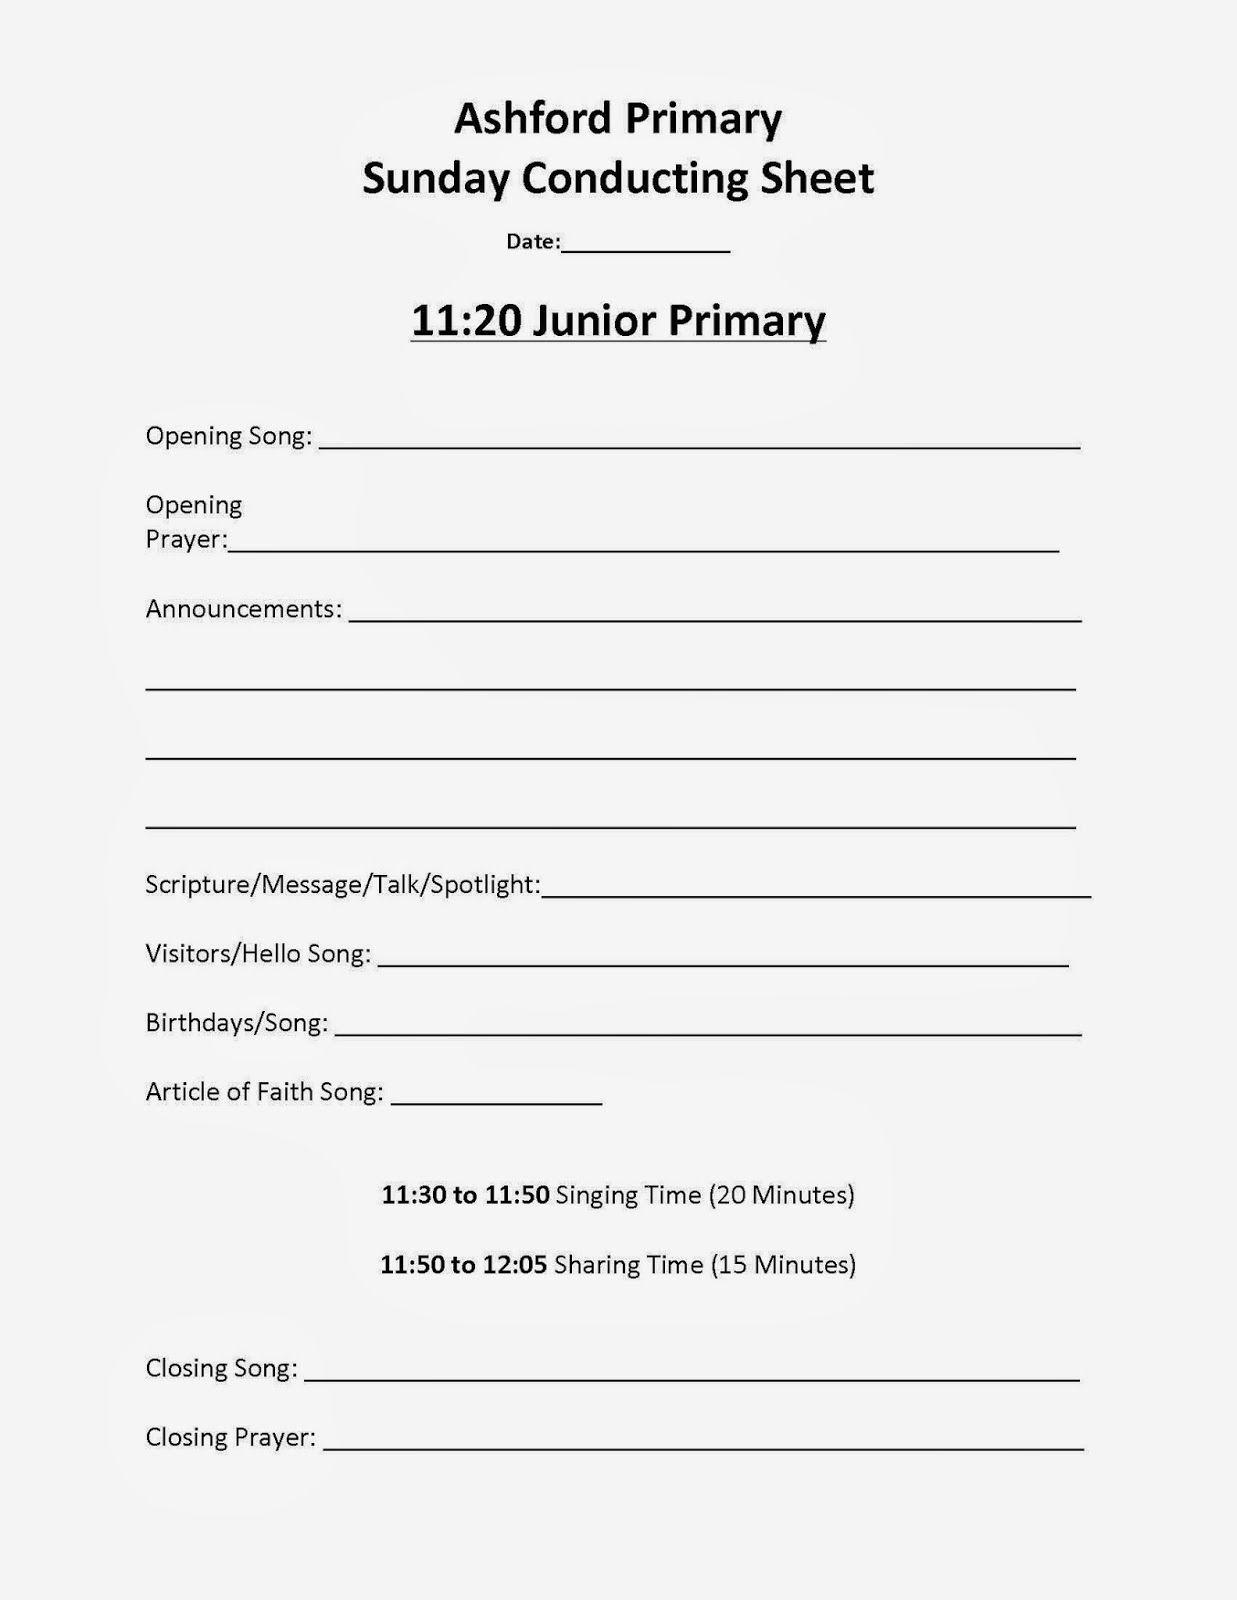 Always A Secretary Sharing Time Agenda Primary Sharing Time Lds Primary Lds Primary Singing Time